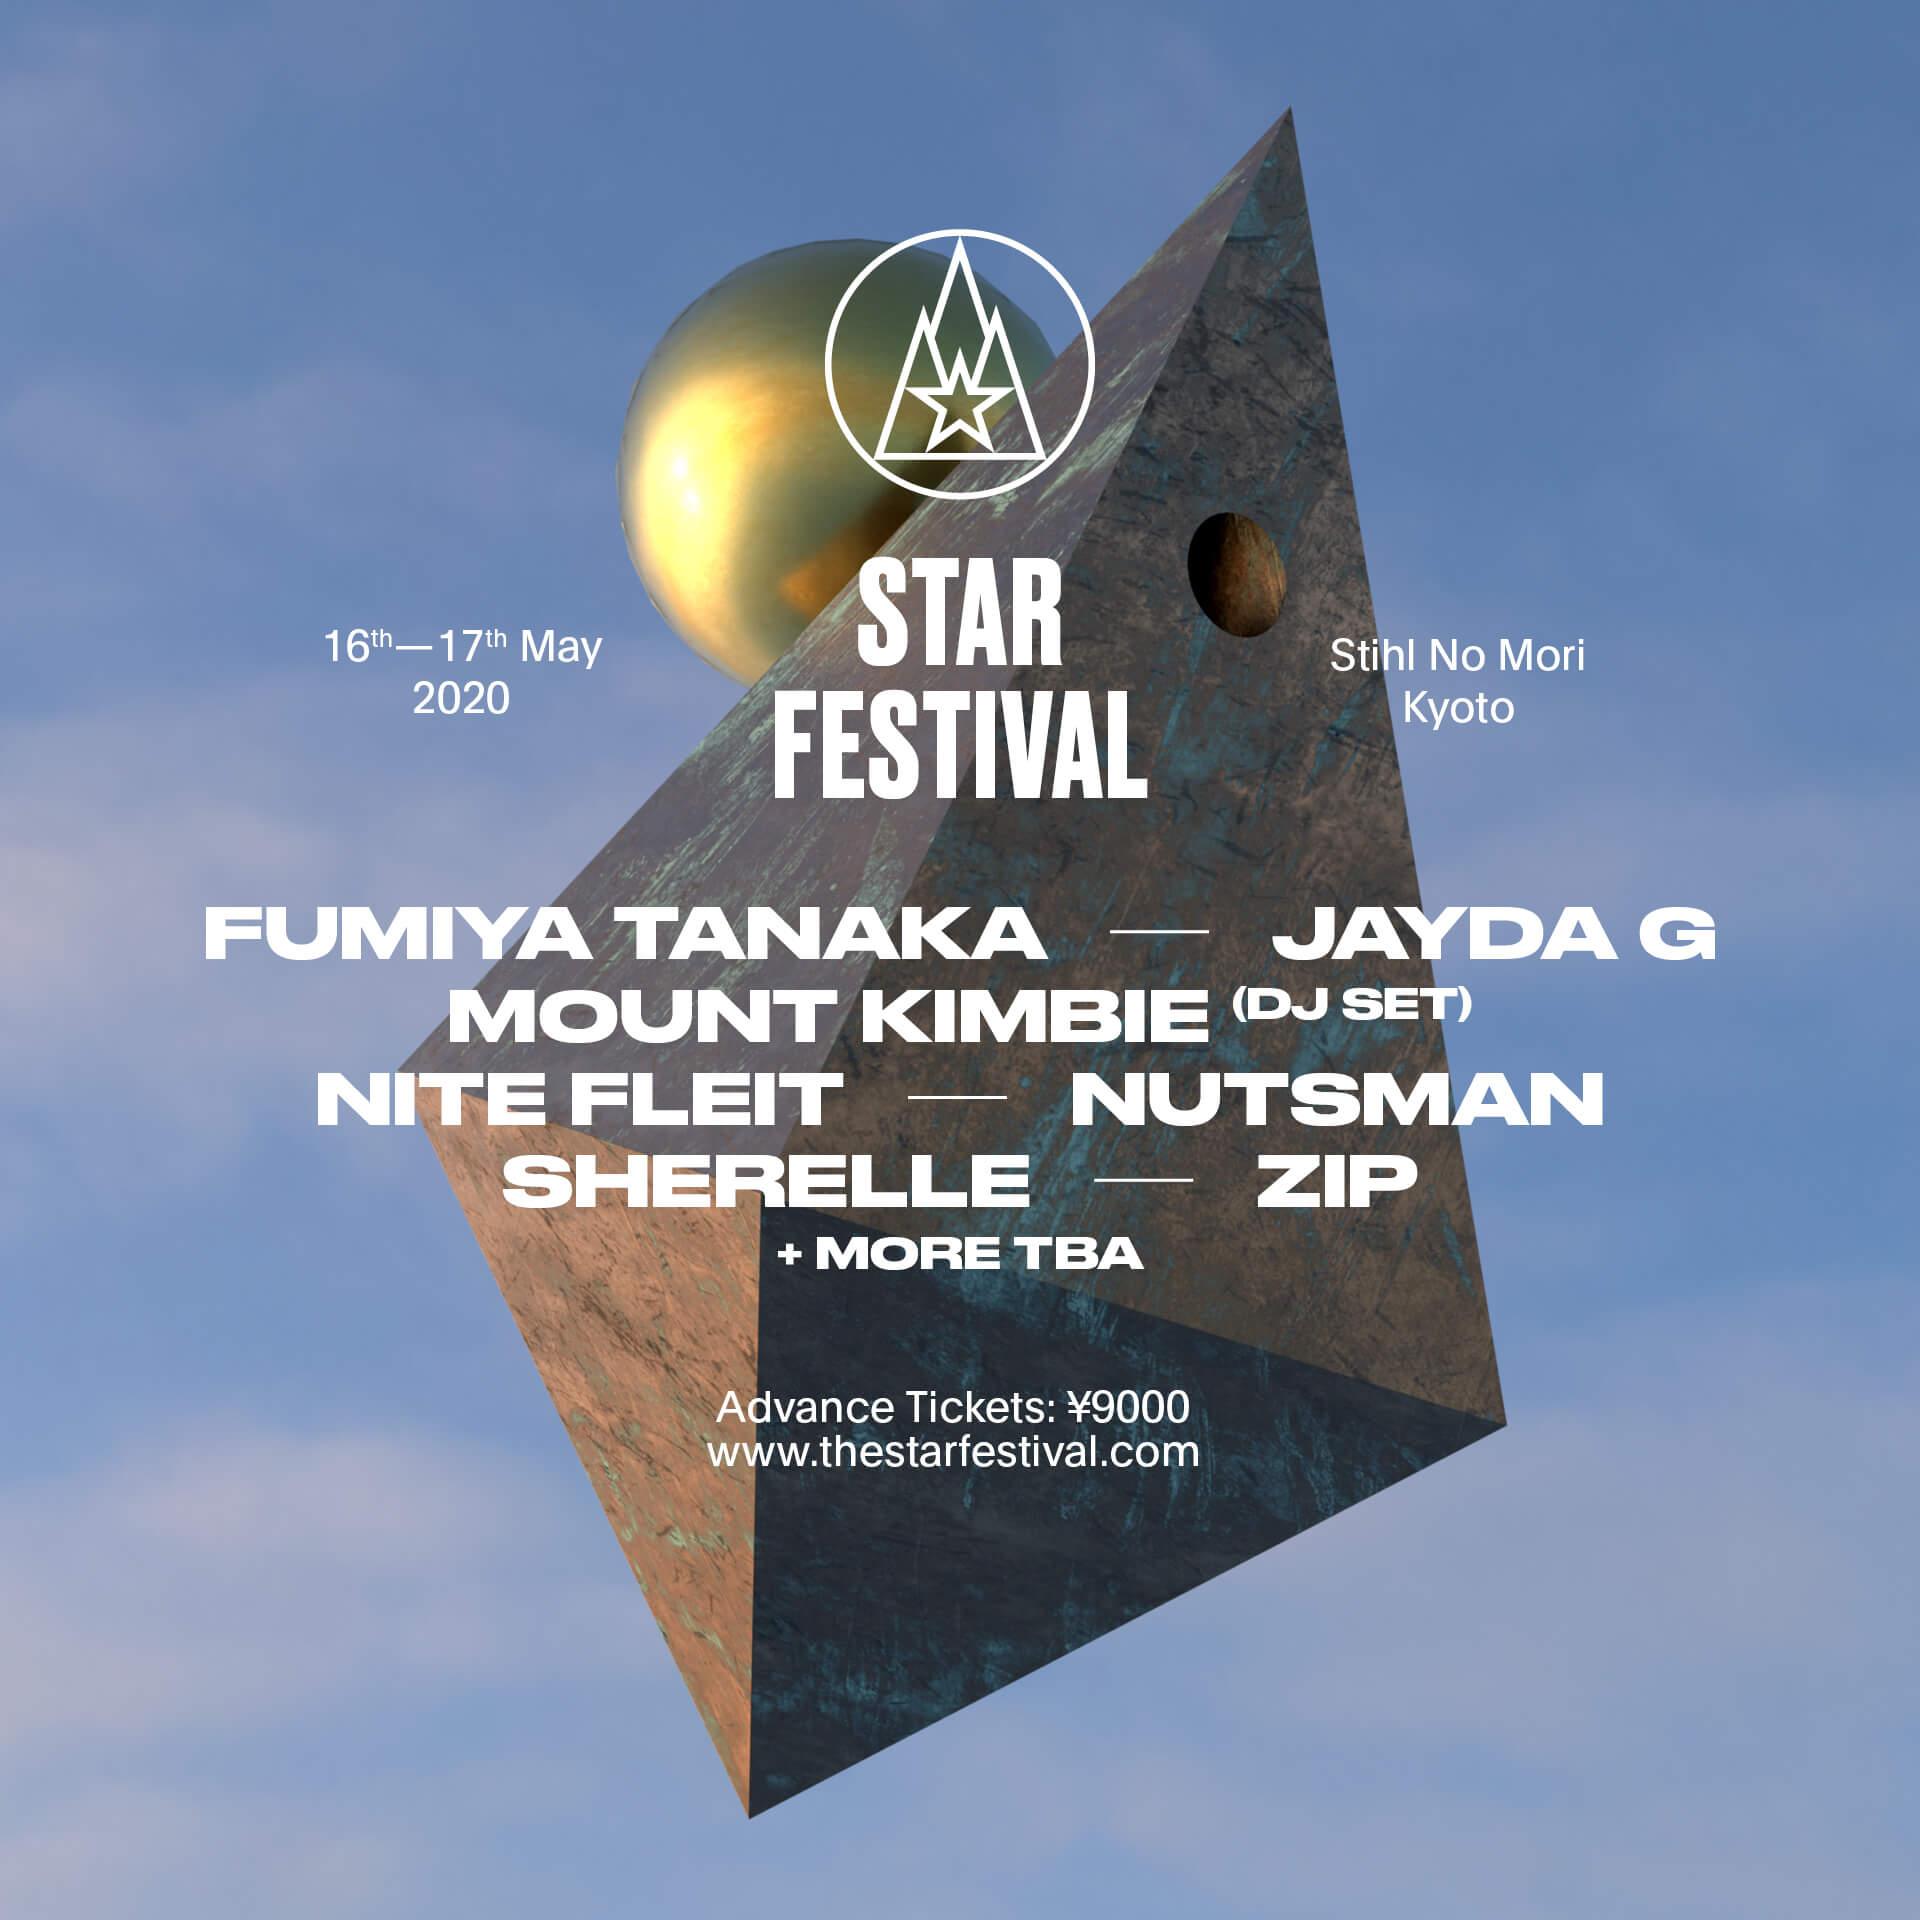 <STAR FESTIVAL 2020>第1弾アーティストにMOUNT KIMBIE、Jayda G、SHERELLEら7組 music200203_starfestival_7